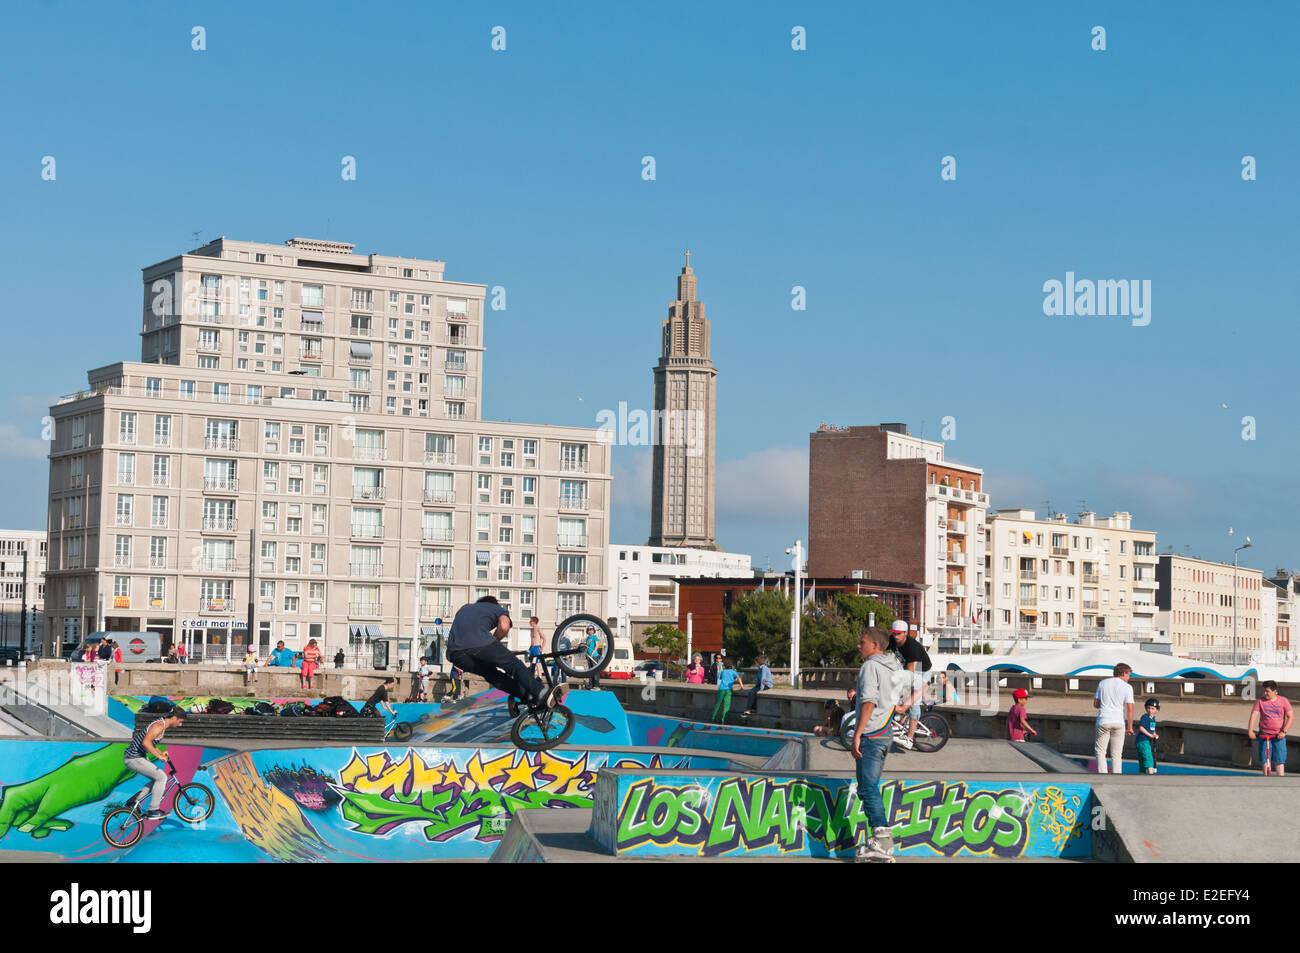 Le Havre city, Haute Normandie, France, Europe - Stock Image